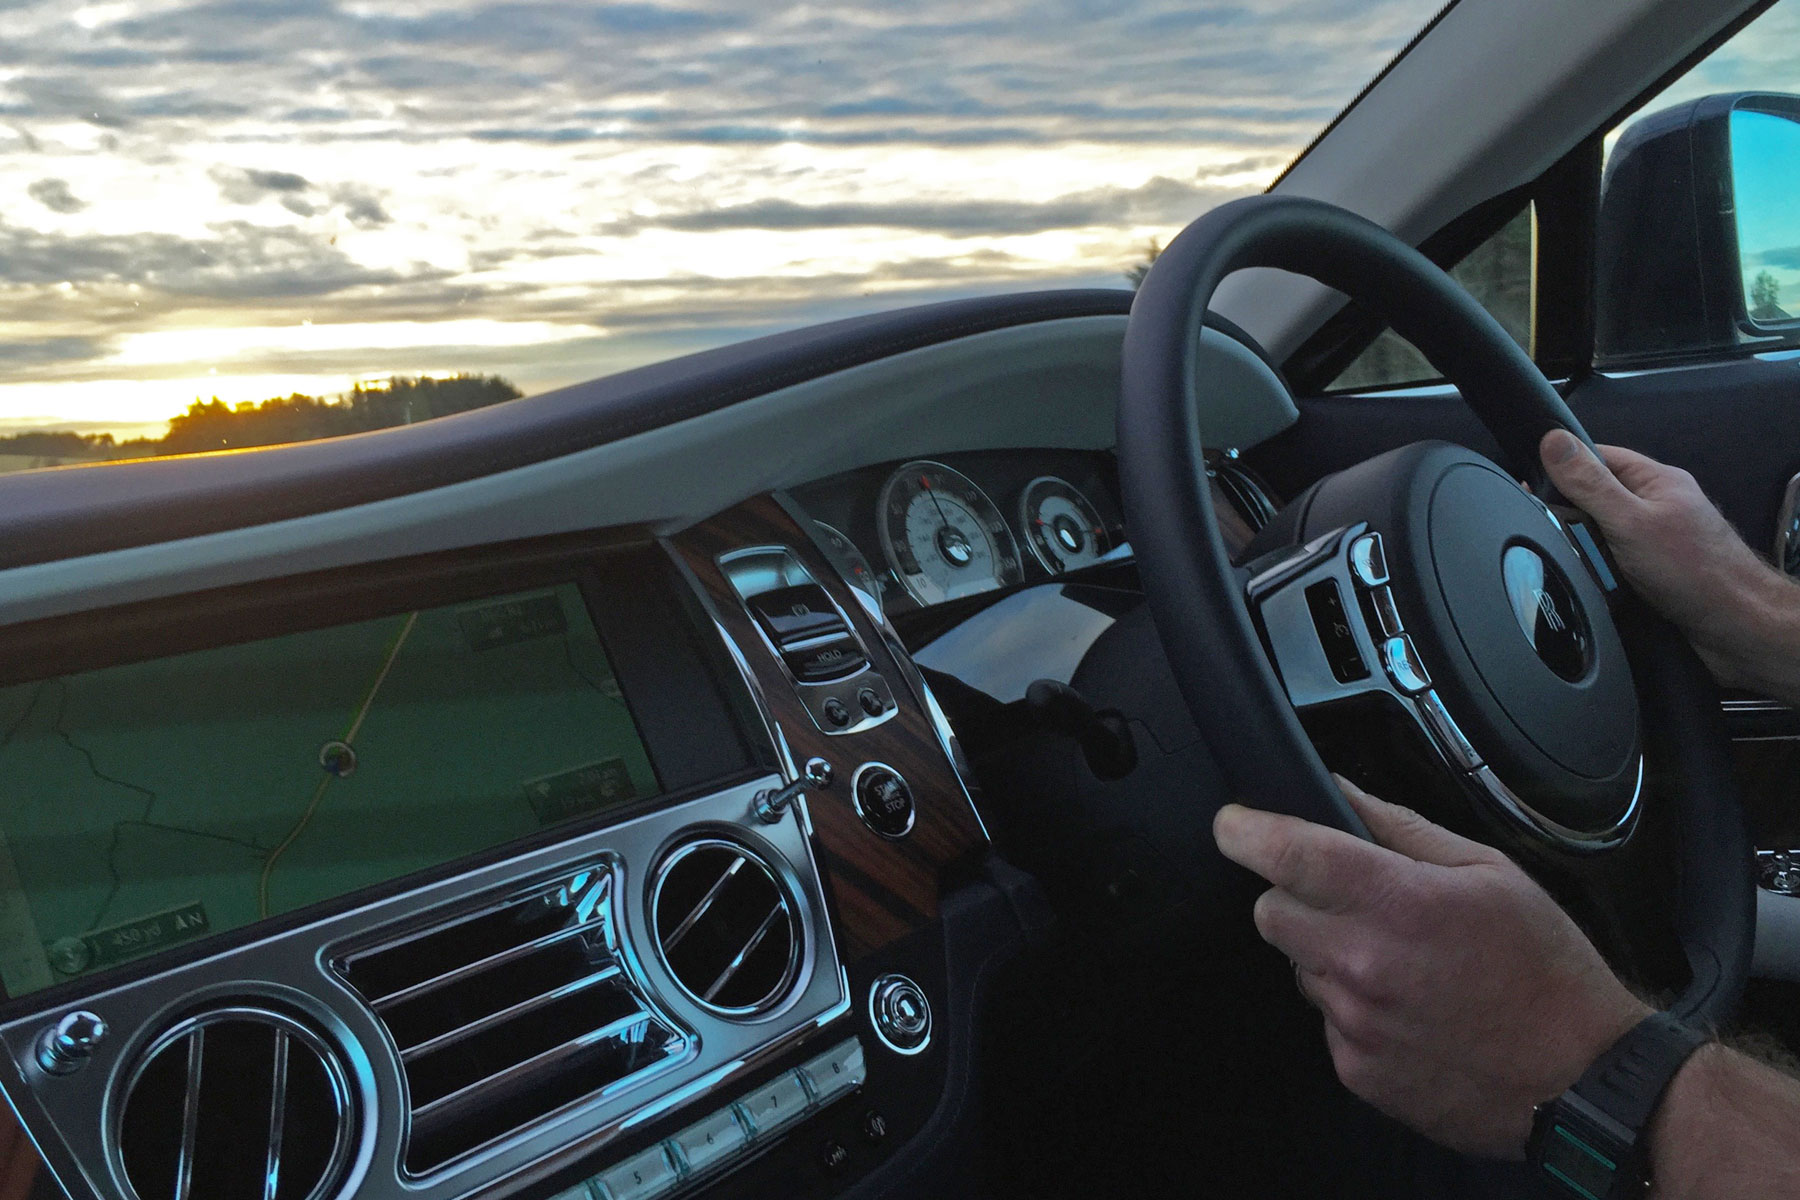 Rolls-Royce Wraith on the road